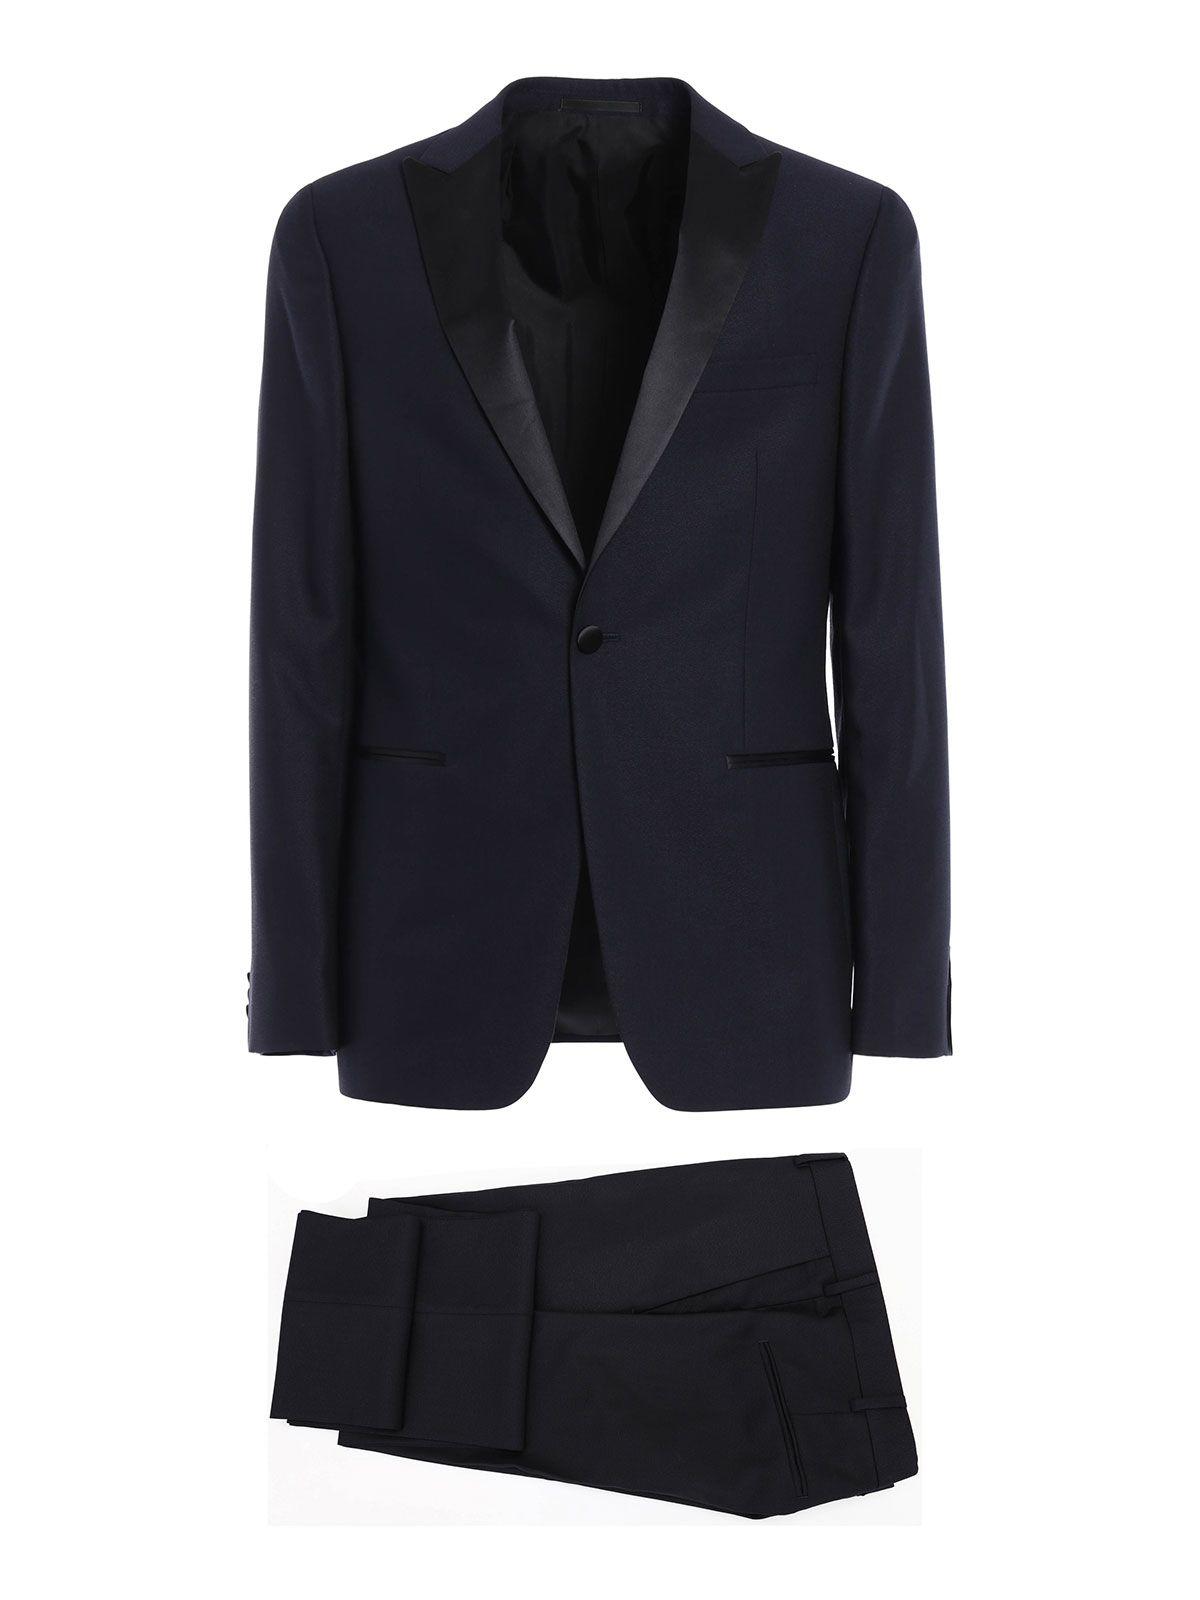 Z Zegna Elegant Dinner Suit